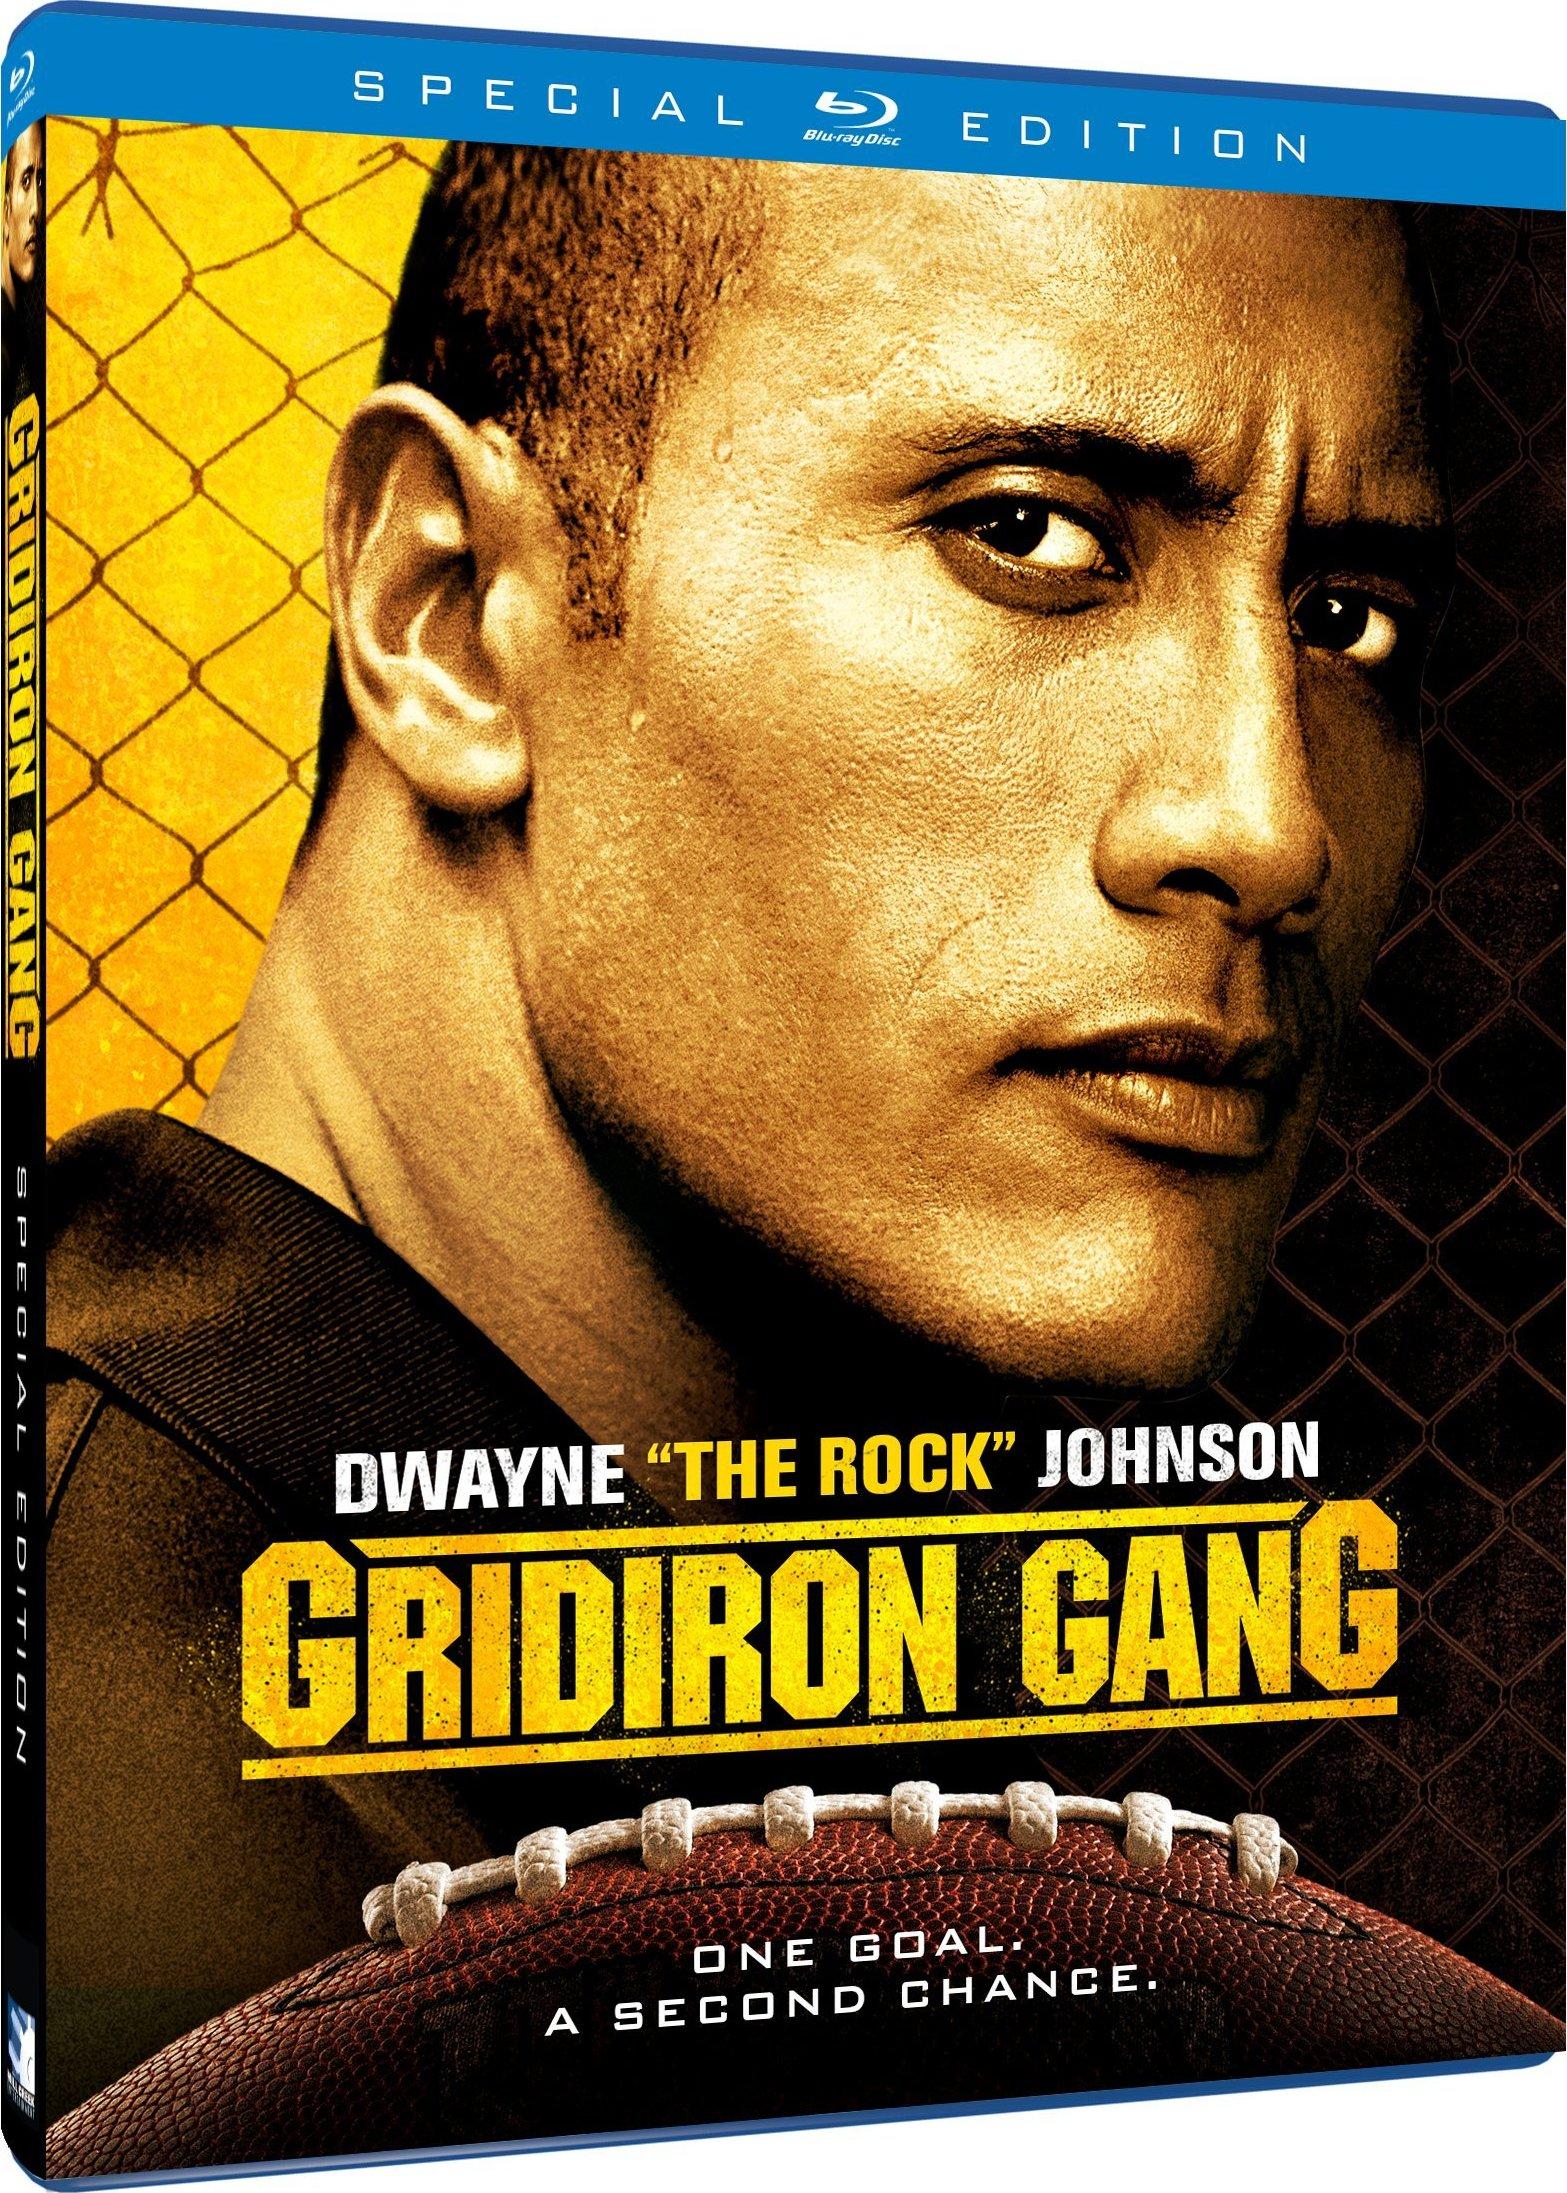 gridiron gang real characters